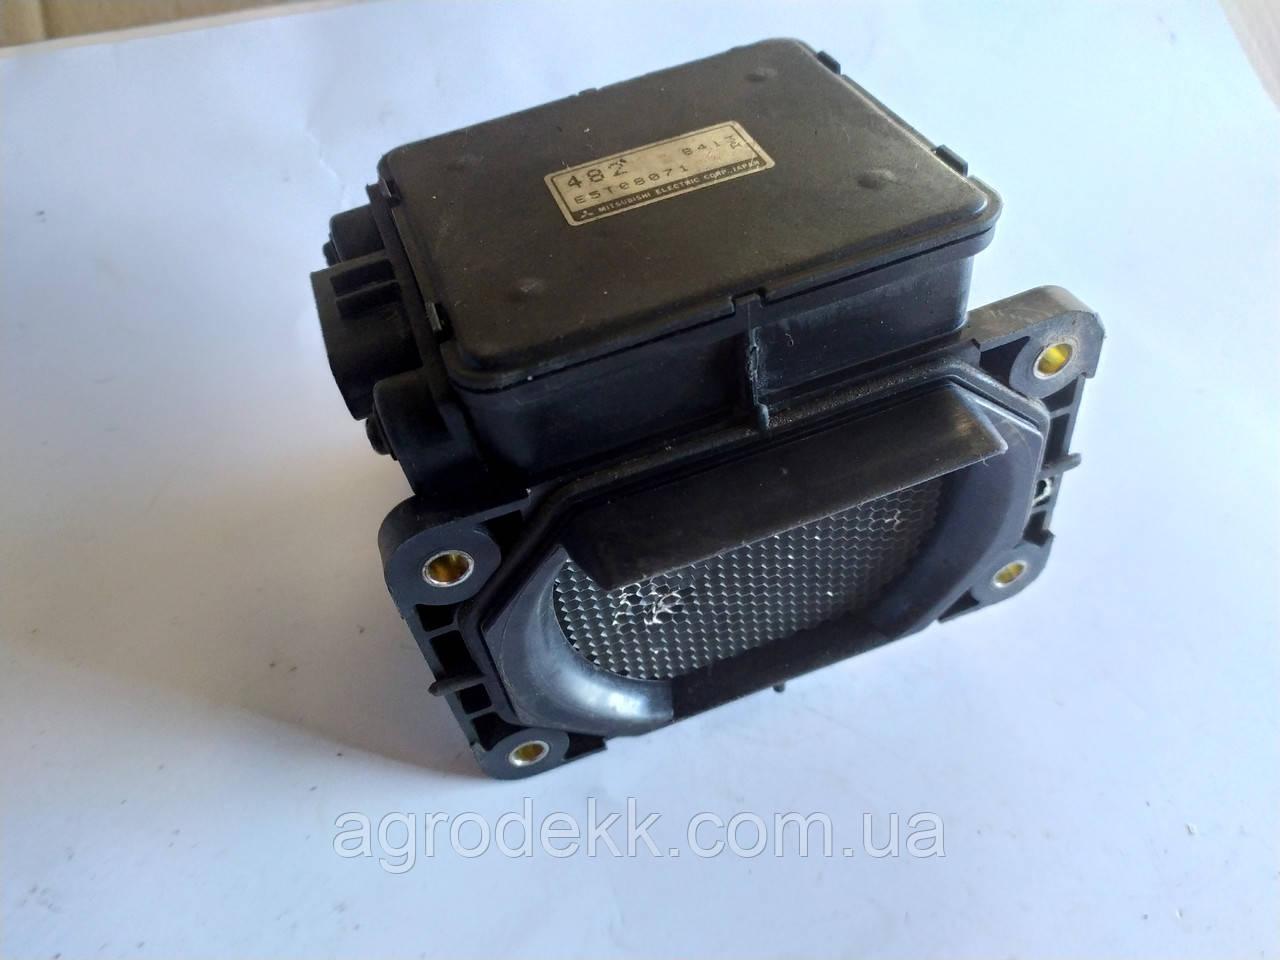 E5T08071 6Y Датчик расходомер воздуха Galant Pajero Montero Eclipse Challenger Triton Nimbus 2.5 E5T08071 6Y12